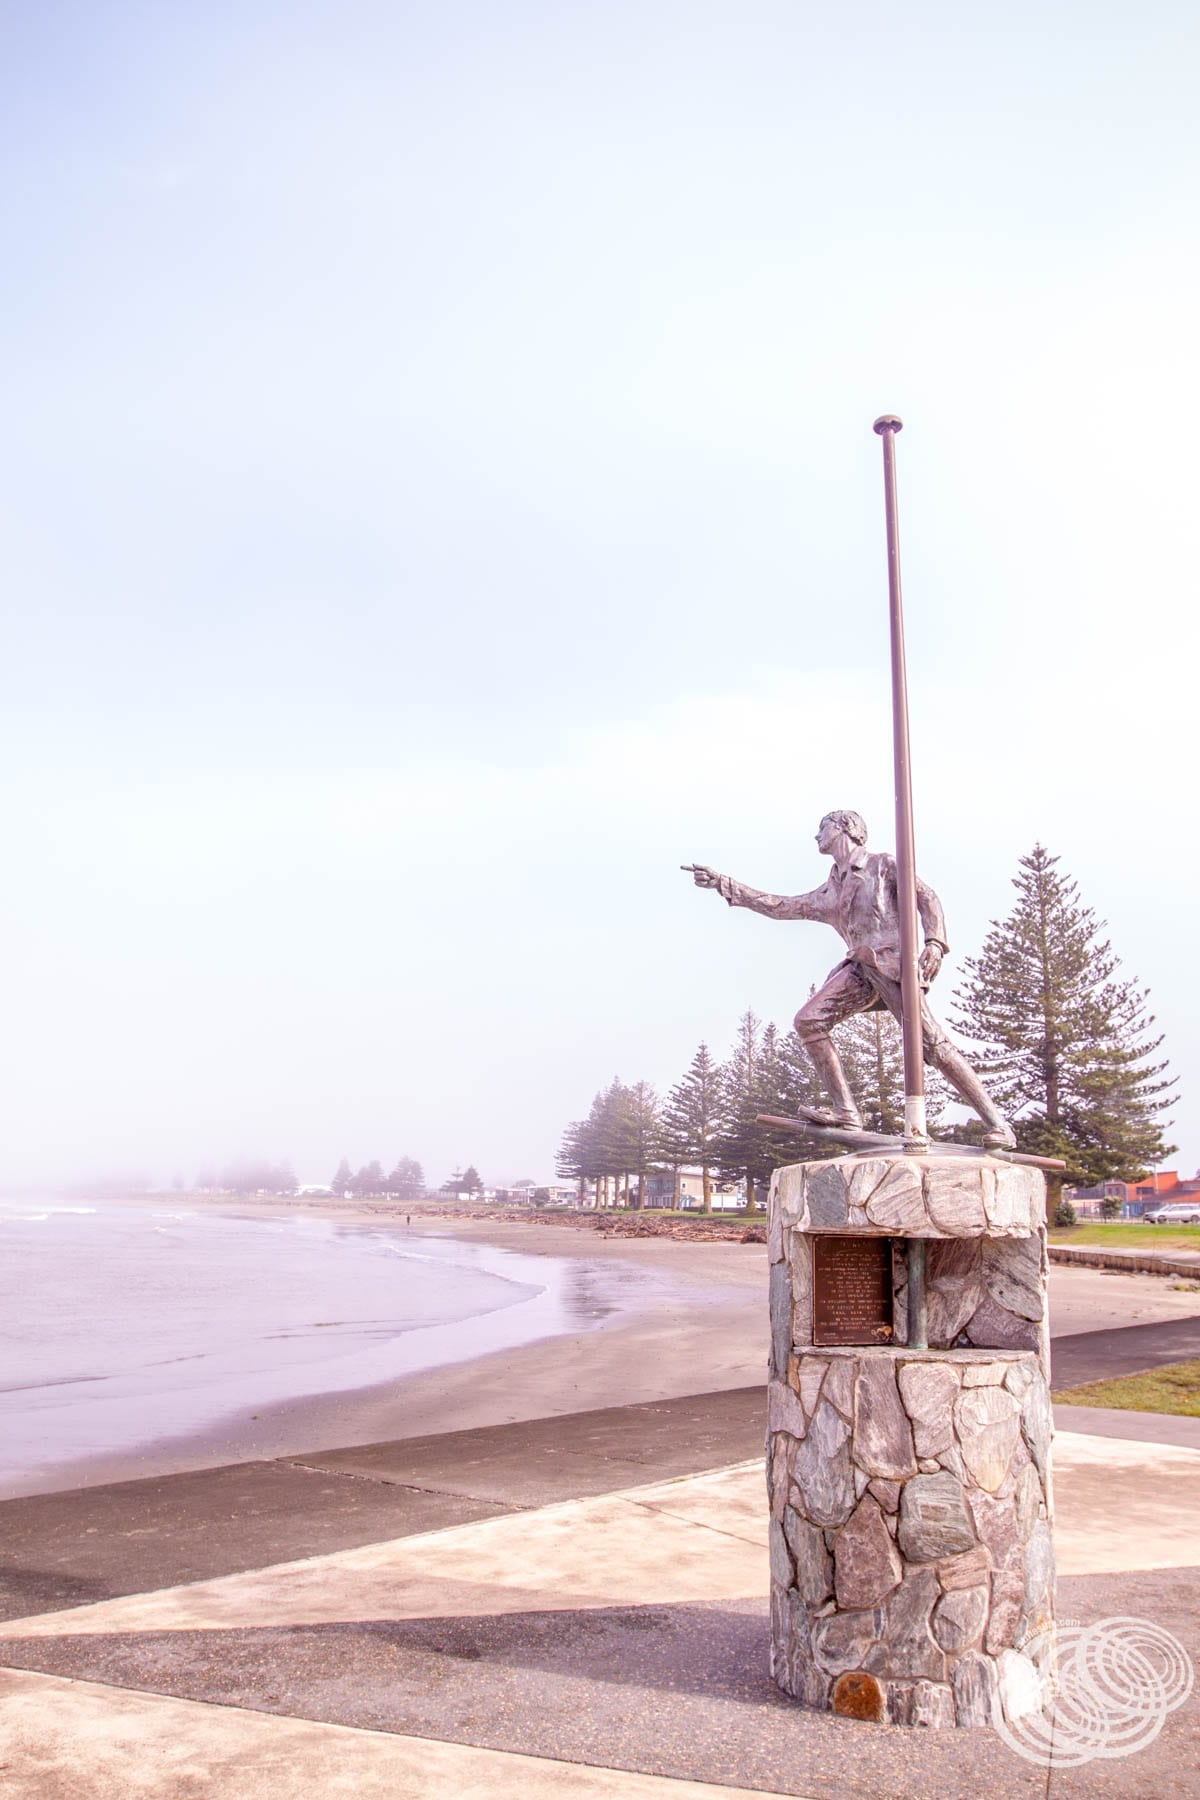 Nicks Statue in Gisborne